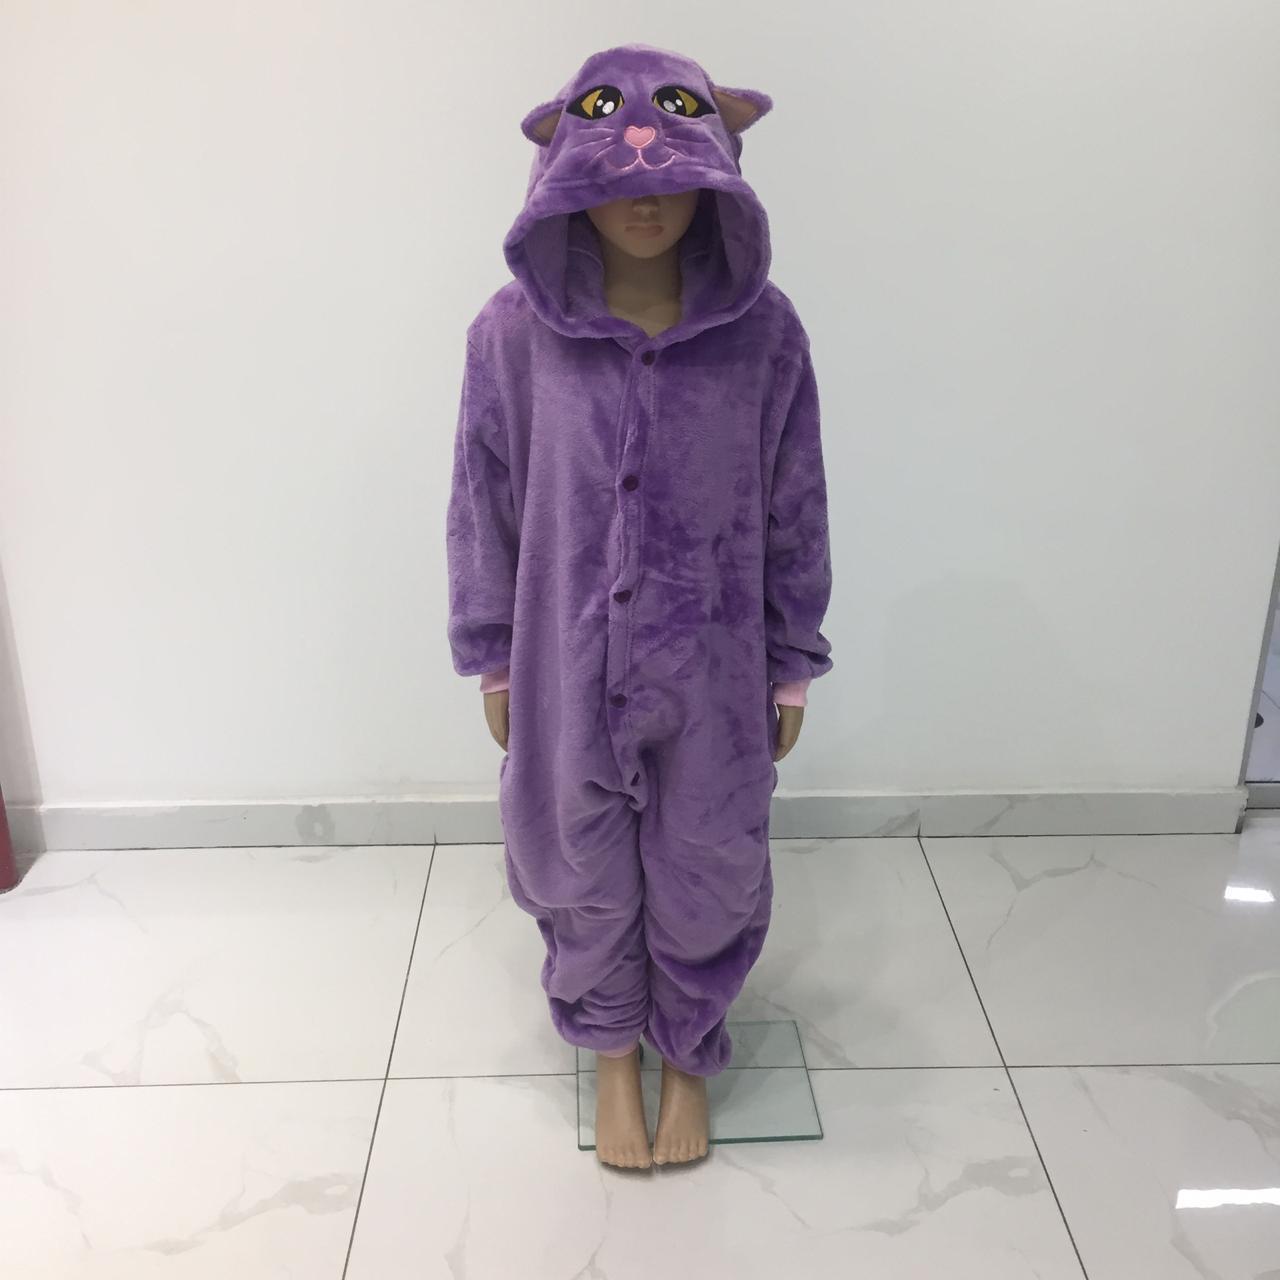 Детская  пижама кигуруми кошка Сейлормун